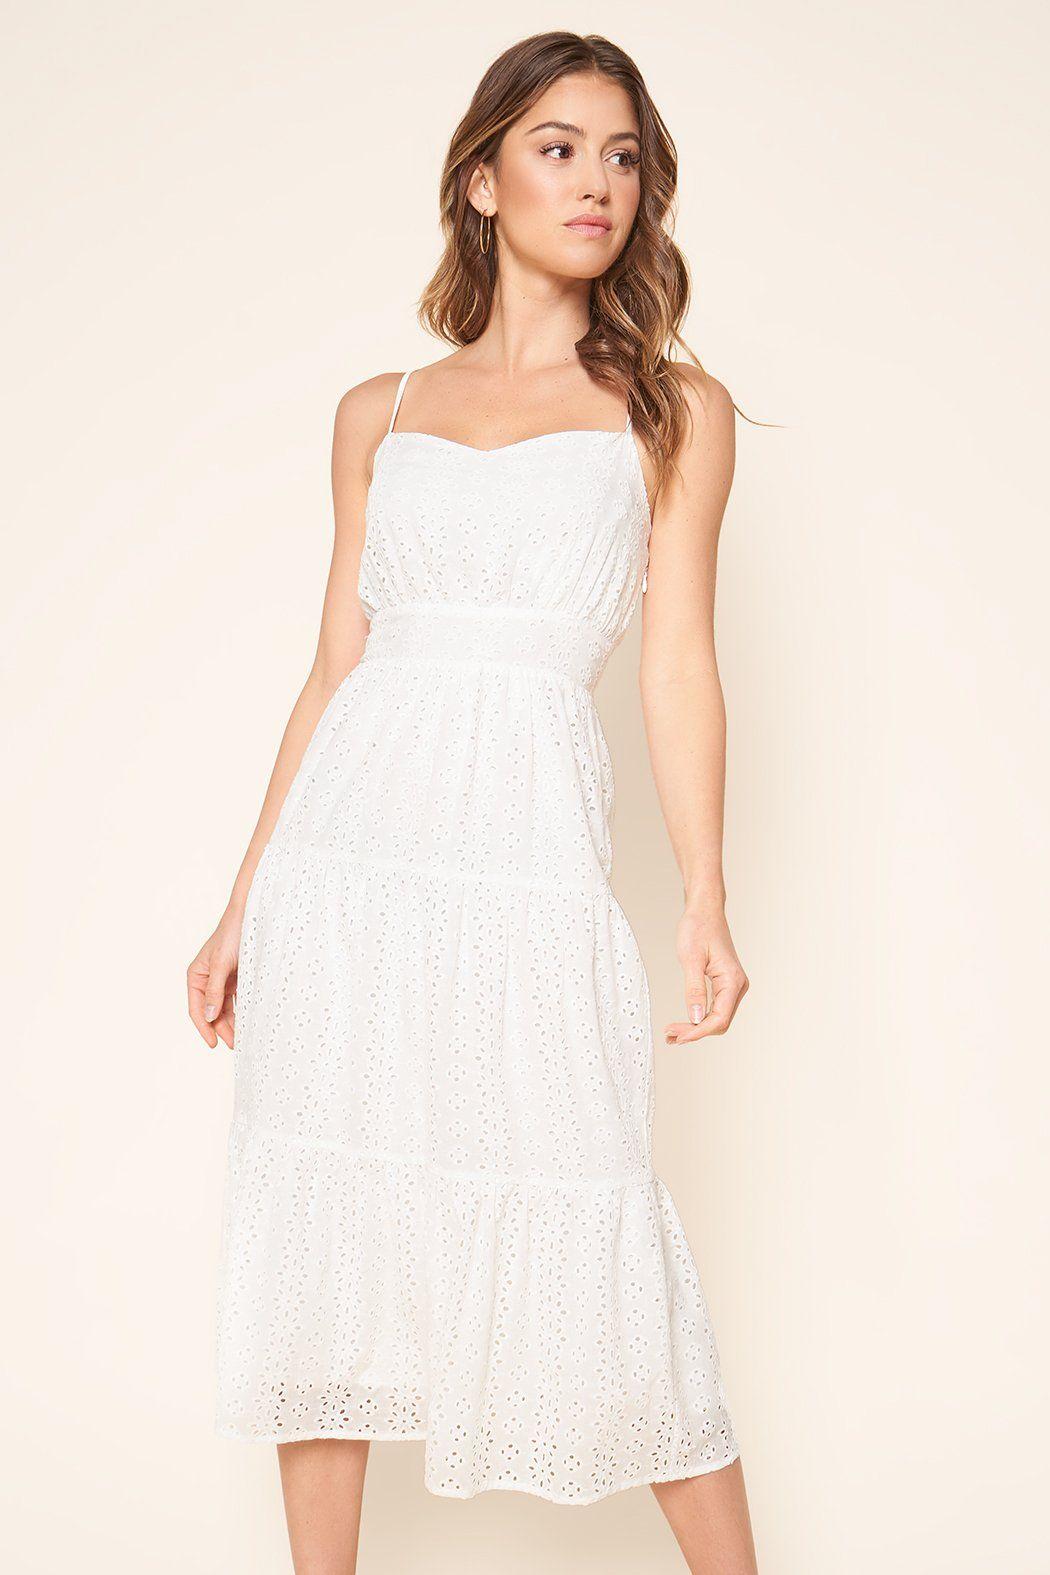 Rilo Eyelet Midi Dress In 2021 Dresses White Corset Dress White Midi Dress [ 1575 x 1050 Pixel ]